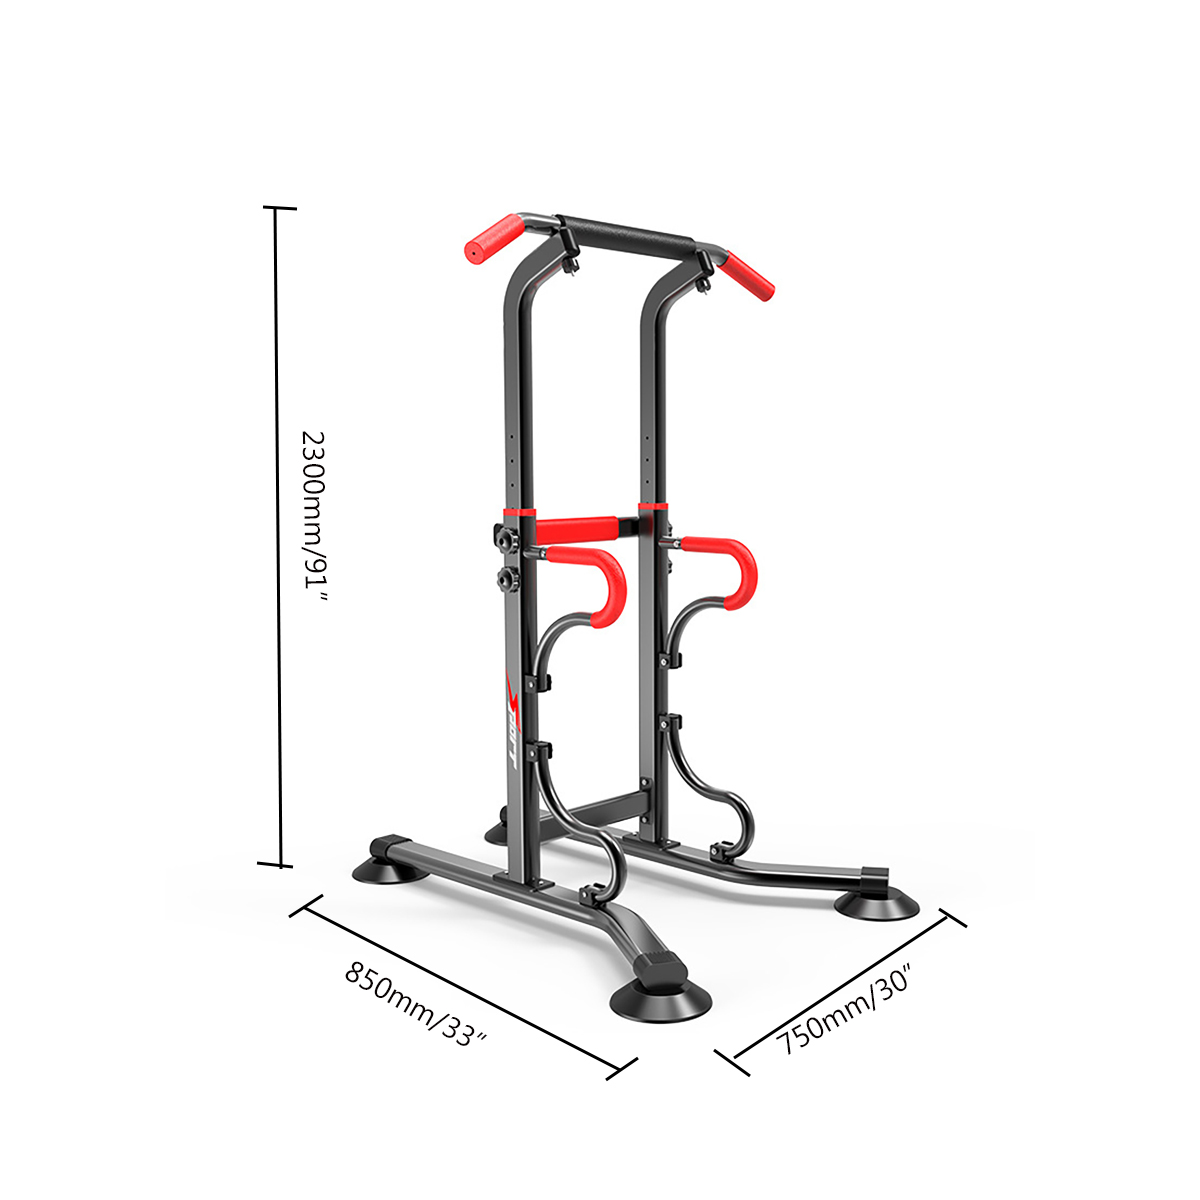 Multi Grip Chin Up Push Up Horizontal Bars Gym Station Power Rack Indoor Fitness Training Height